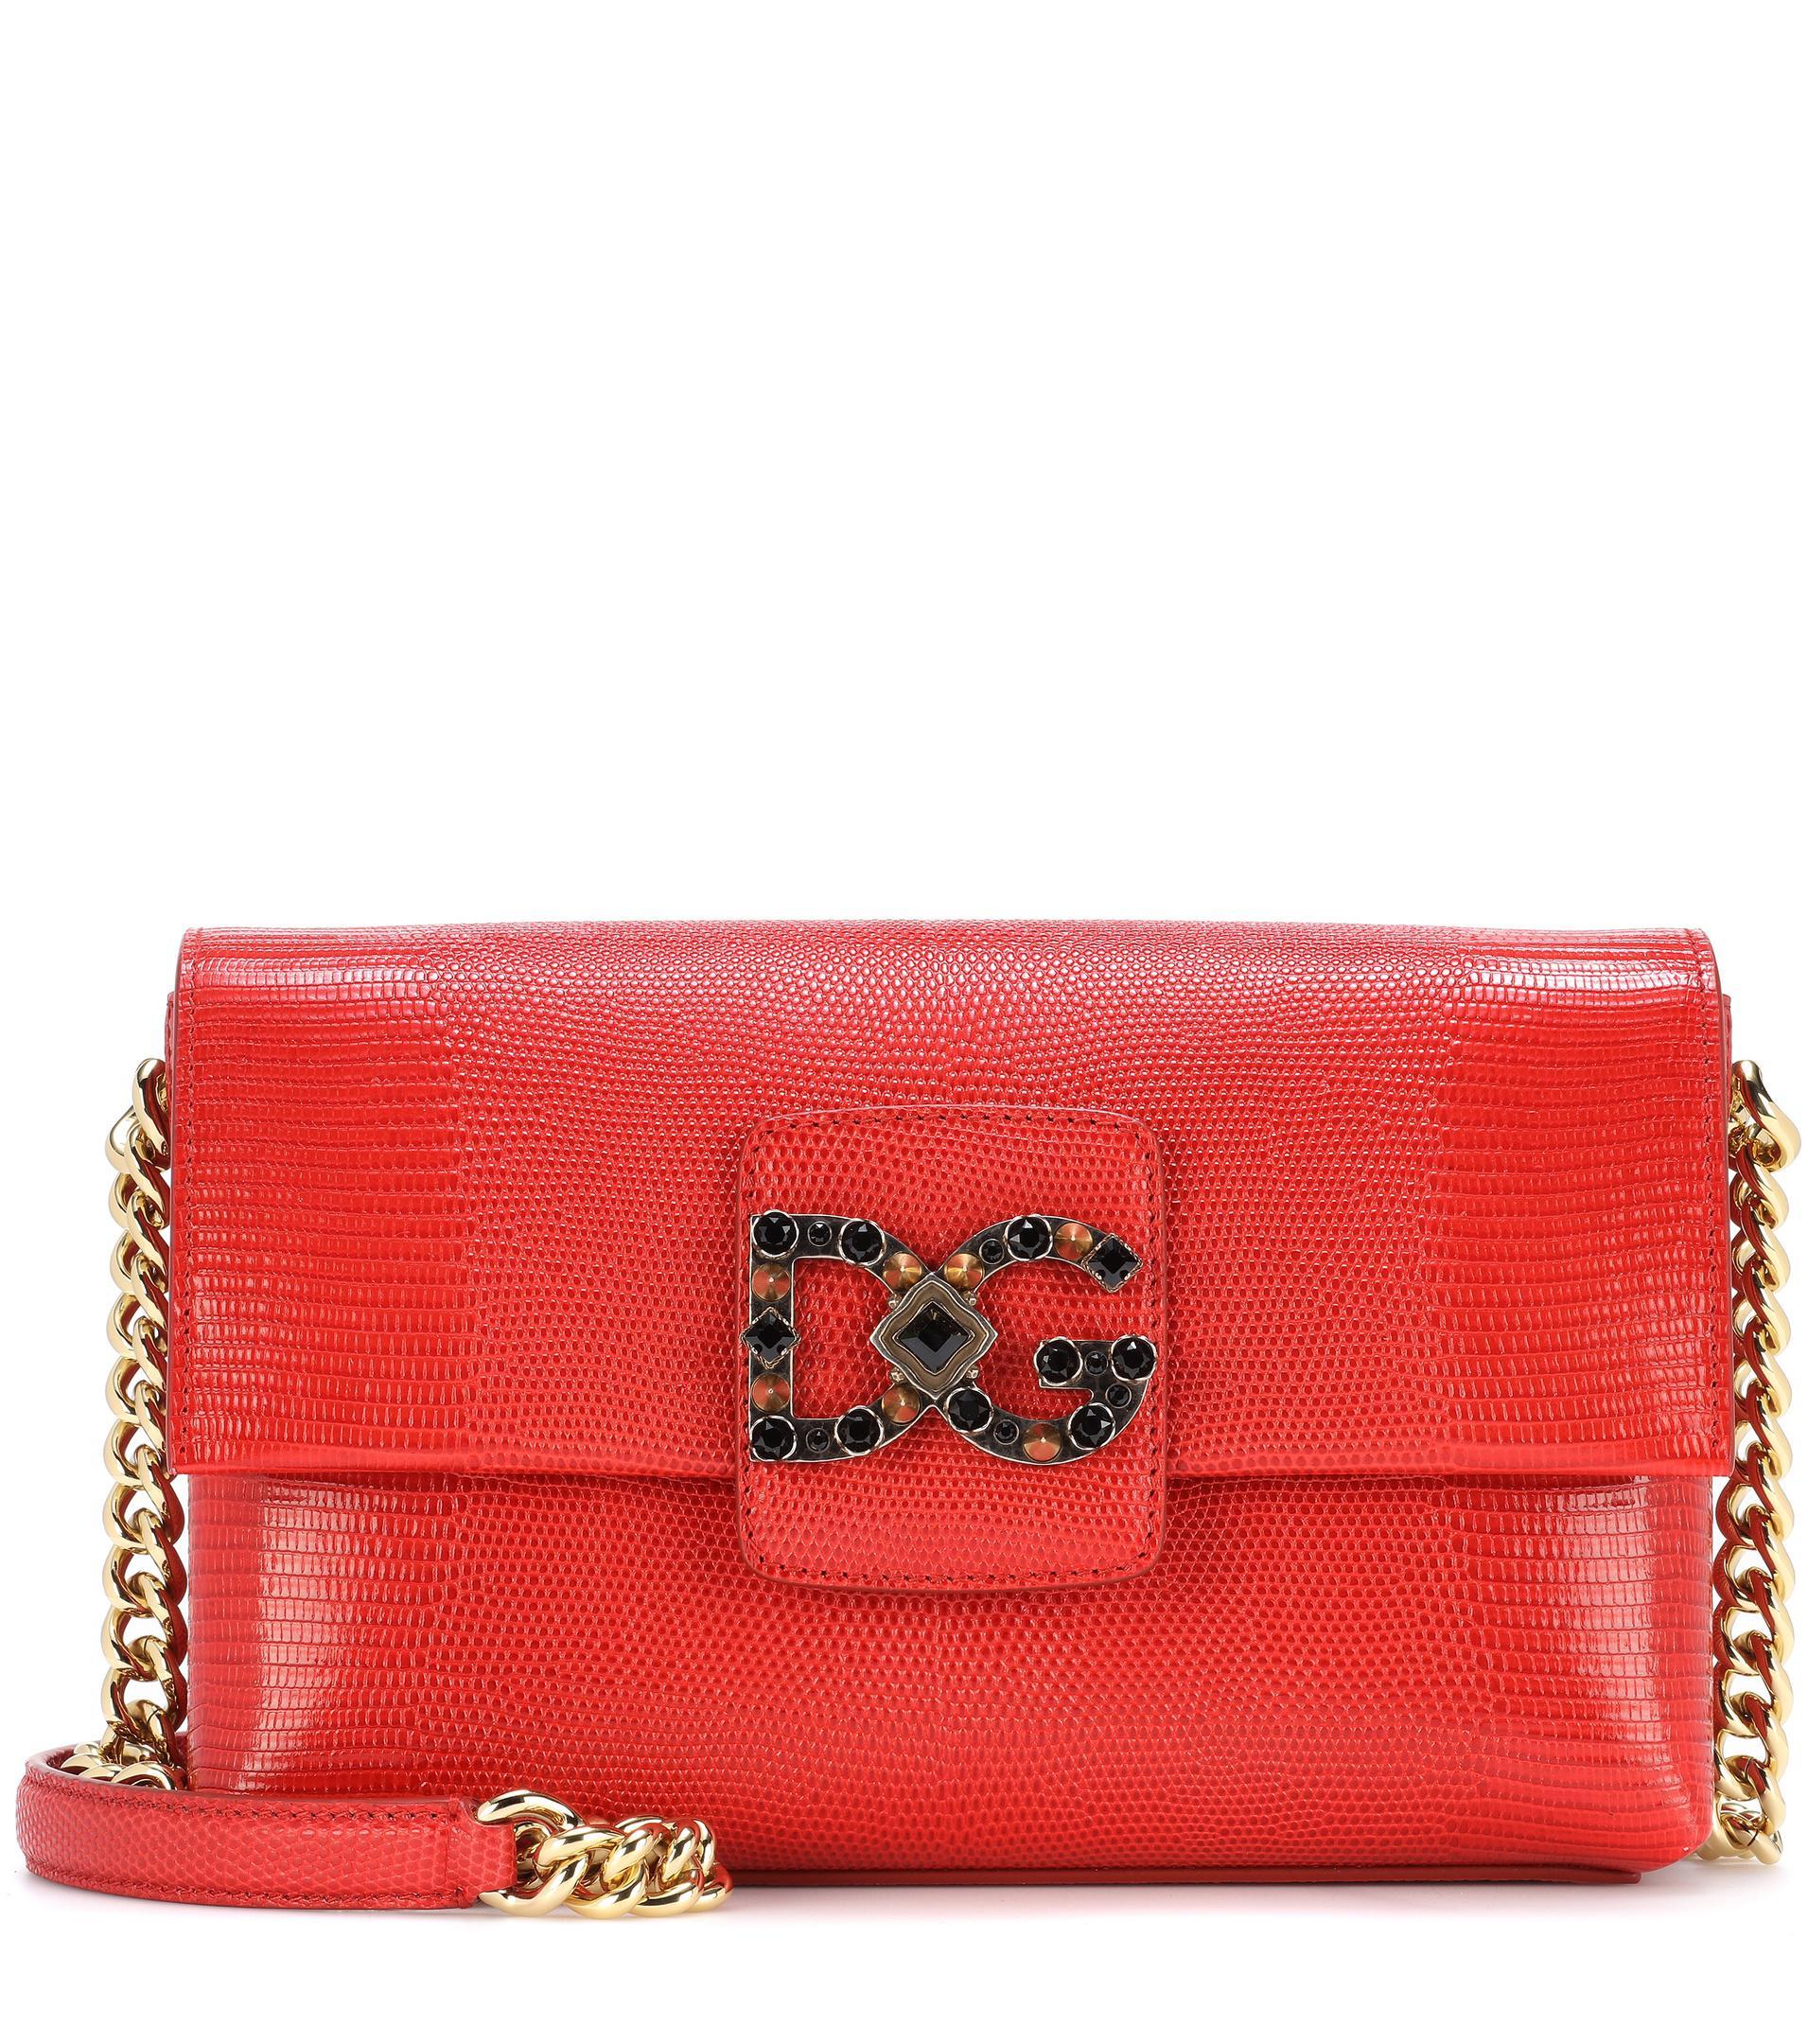 Dolce & Gabbana DG Millennials red leather bag NWQh2NG8aV